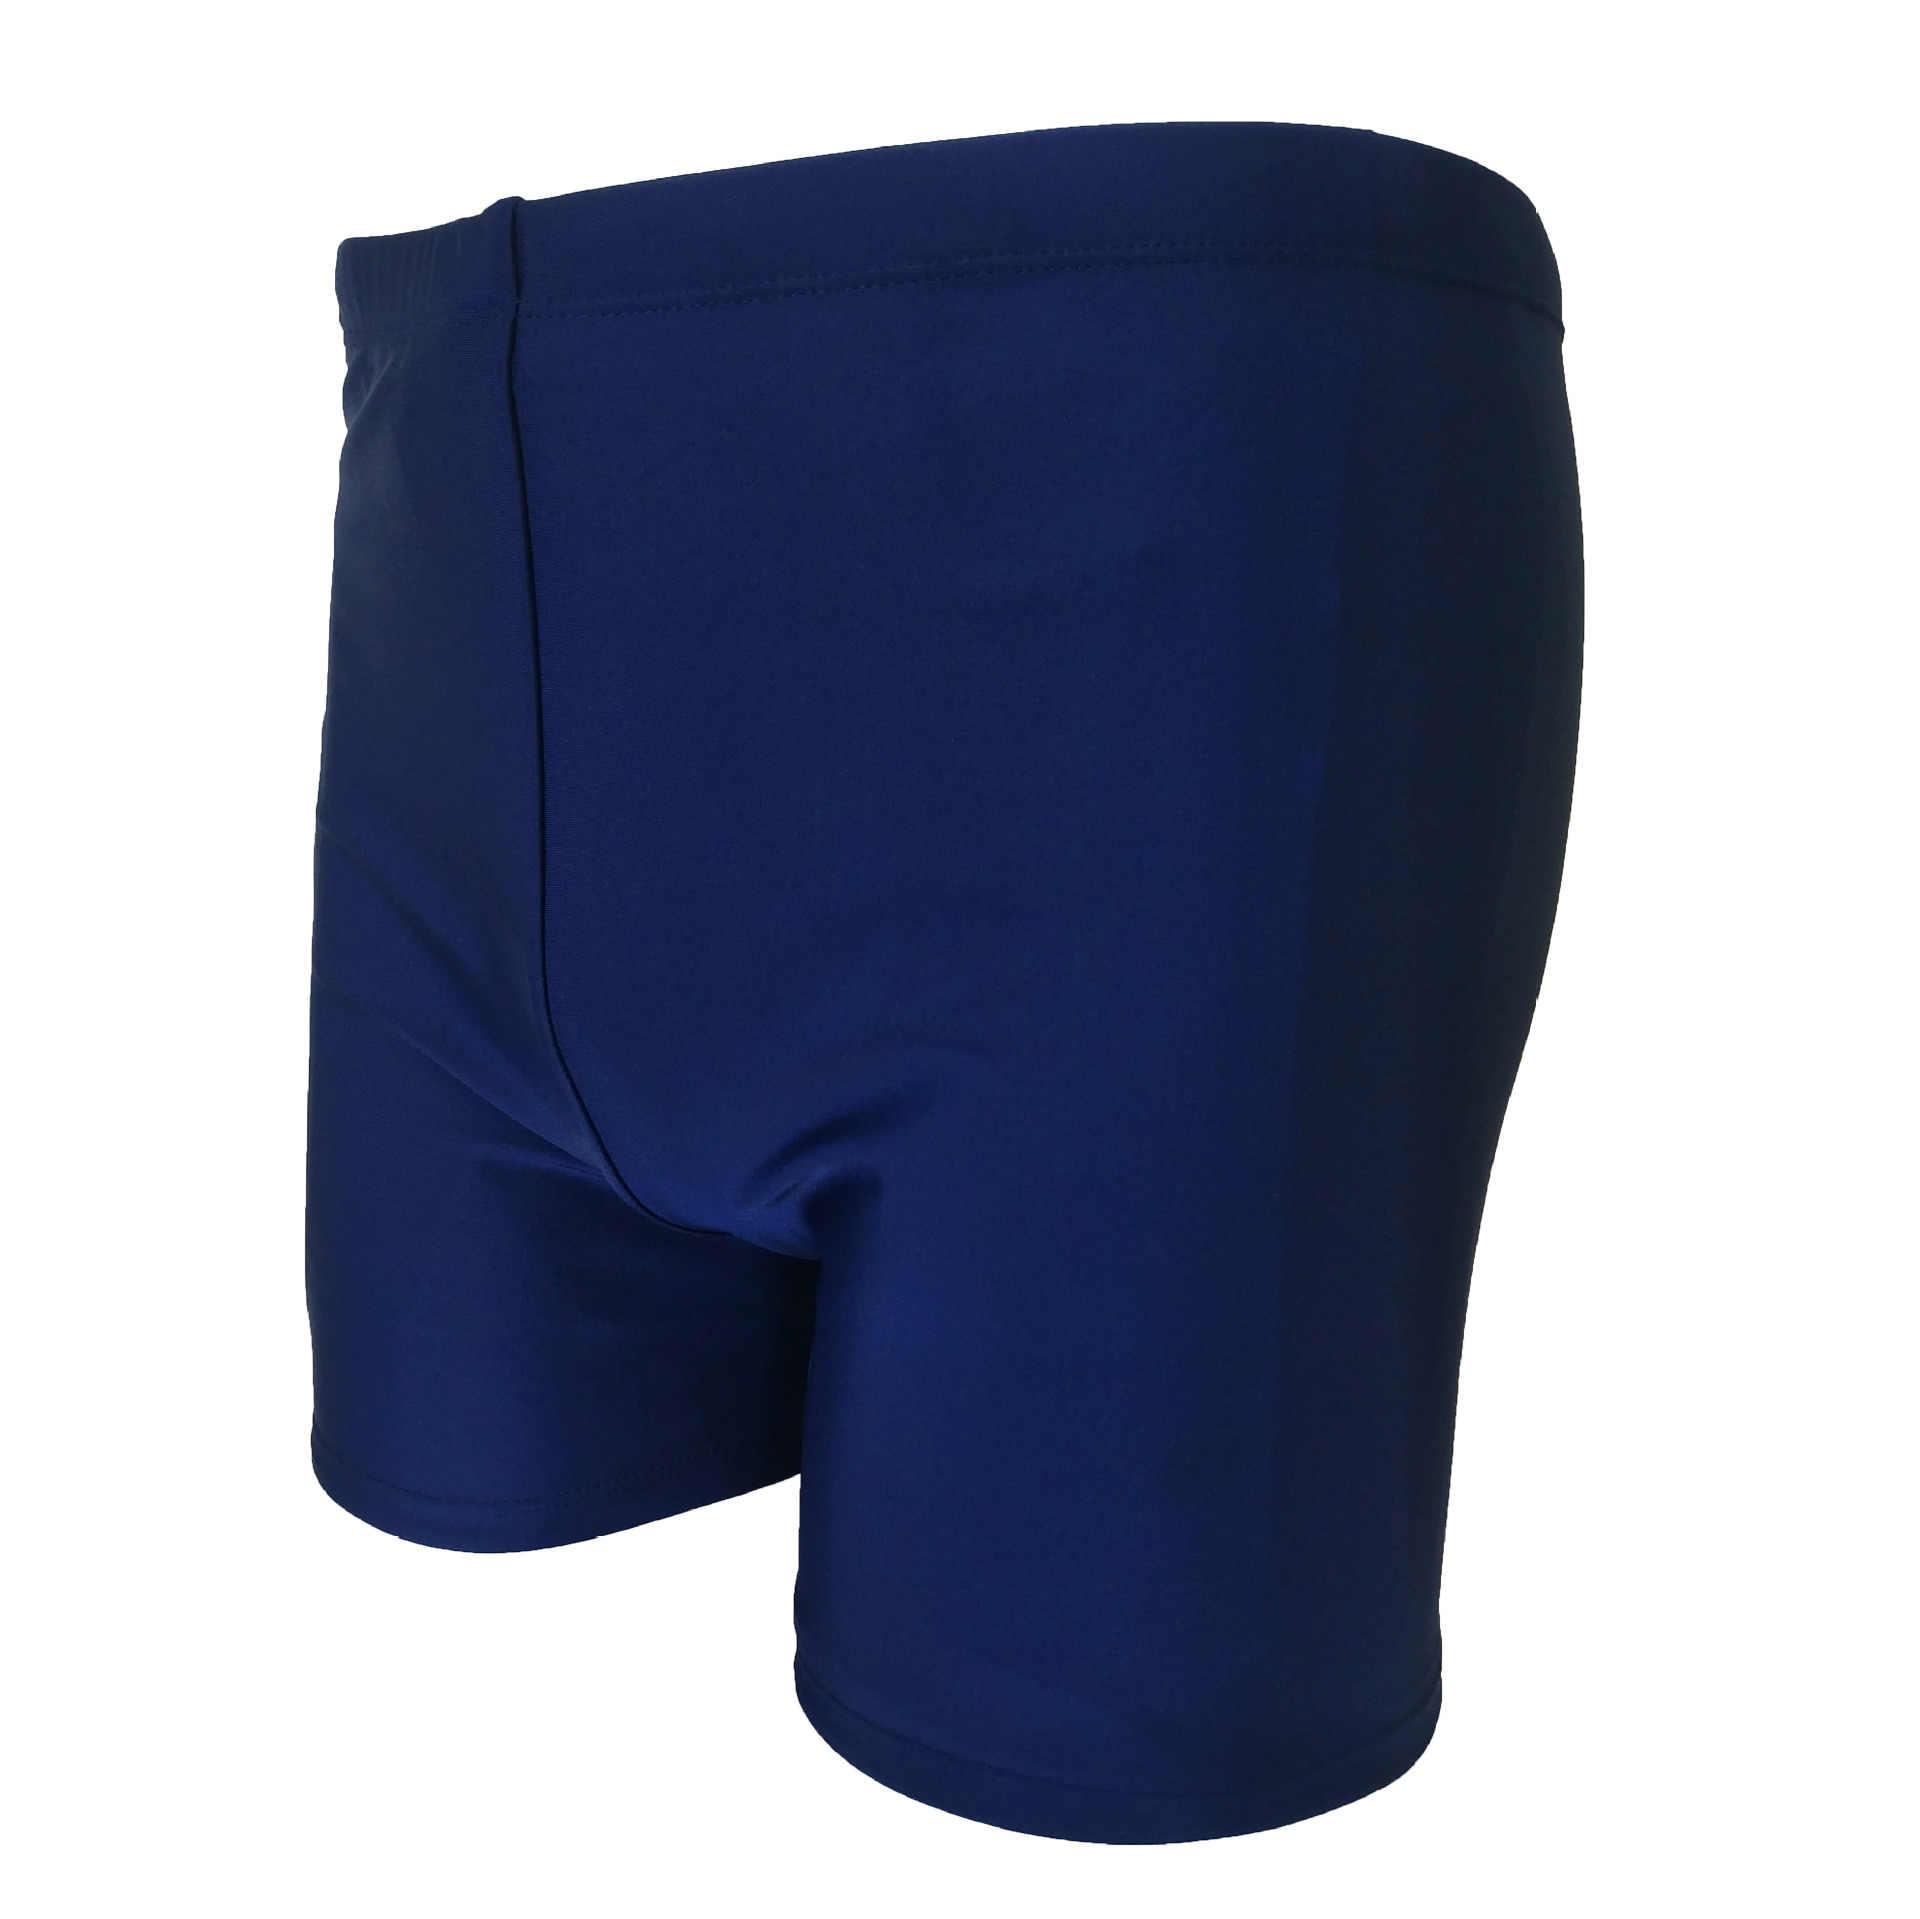 Swimming Shorts For Men Swim Shorts Plus Size Swimwear Mens Swim Trunks Bermuda Surfing Beach wear Swimsuit 3XL-5XL